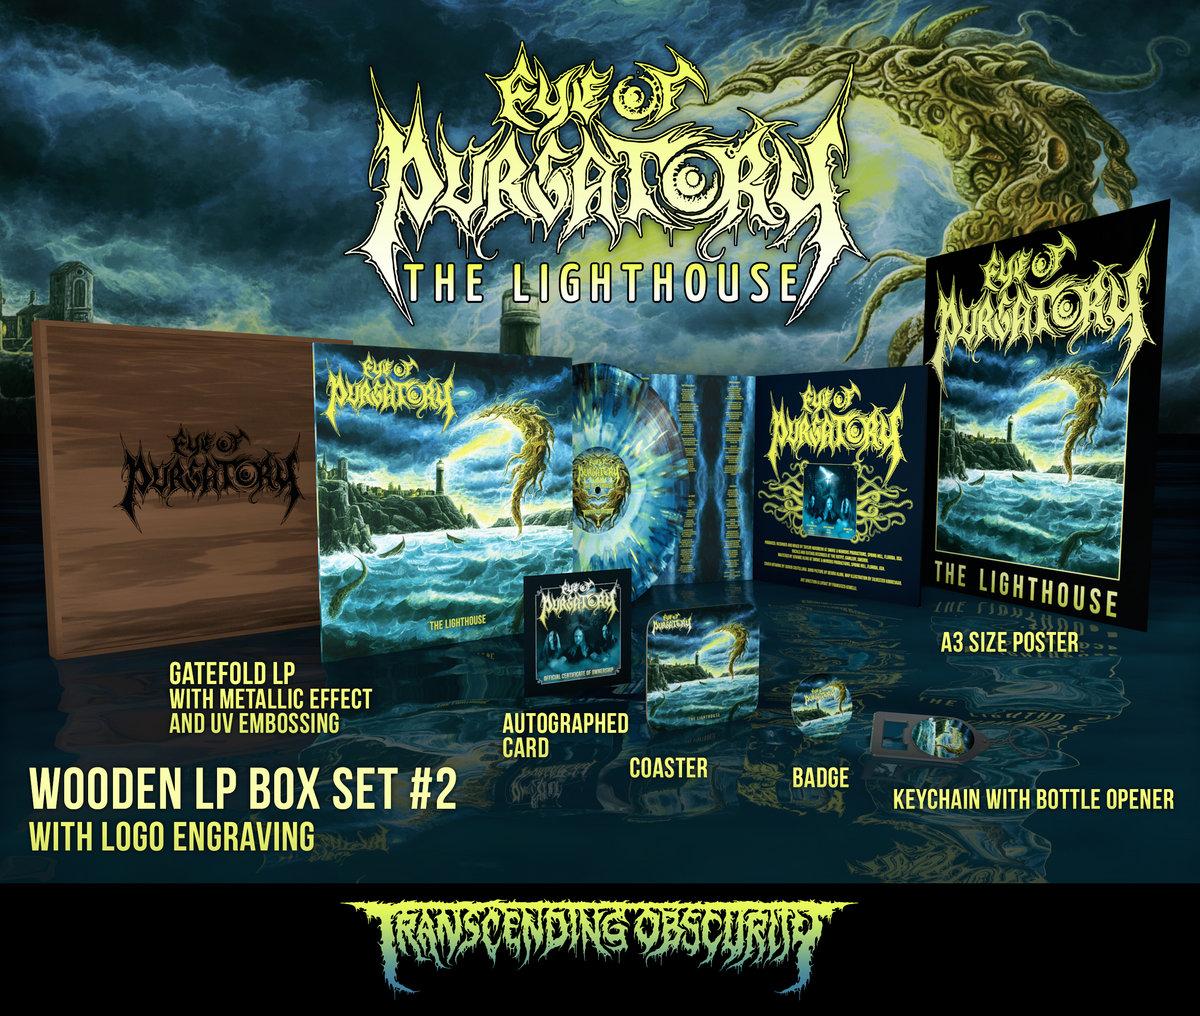 The Lighthouse Wooden LP Box Set